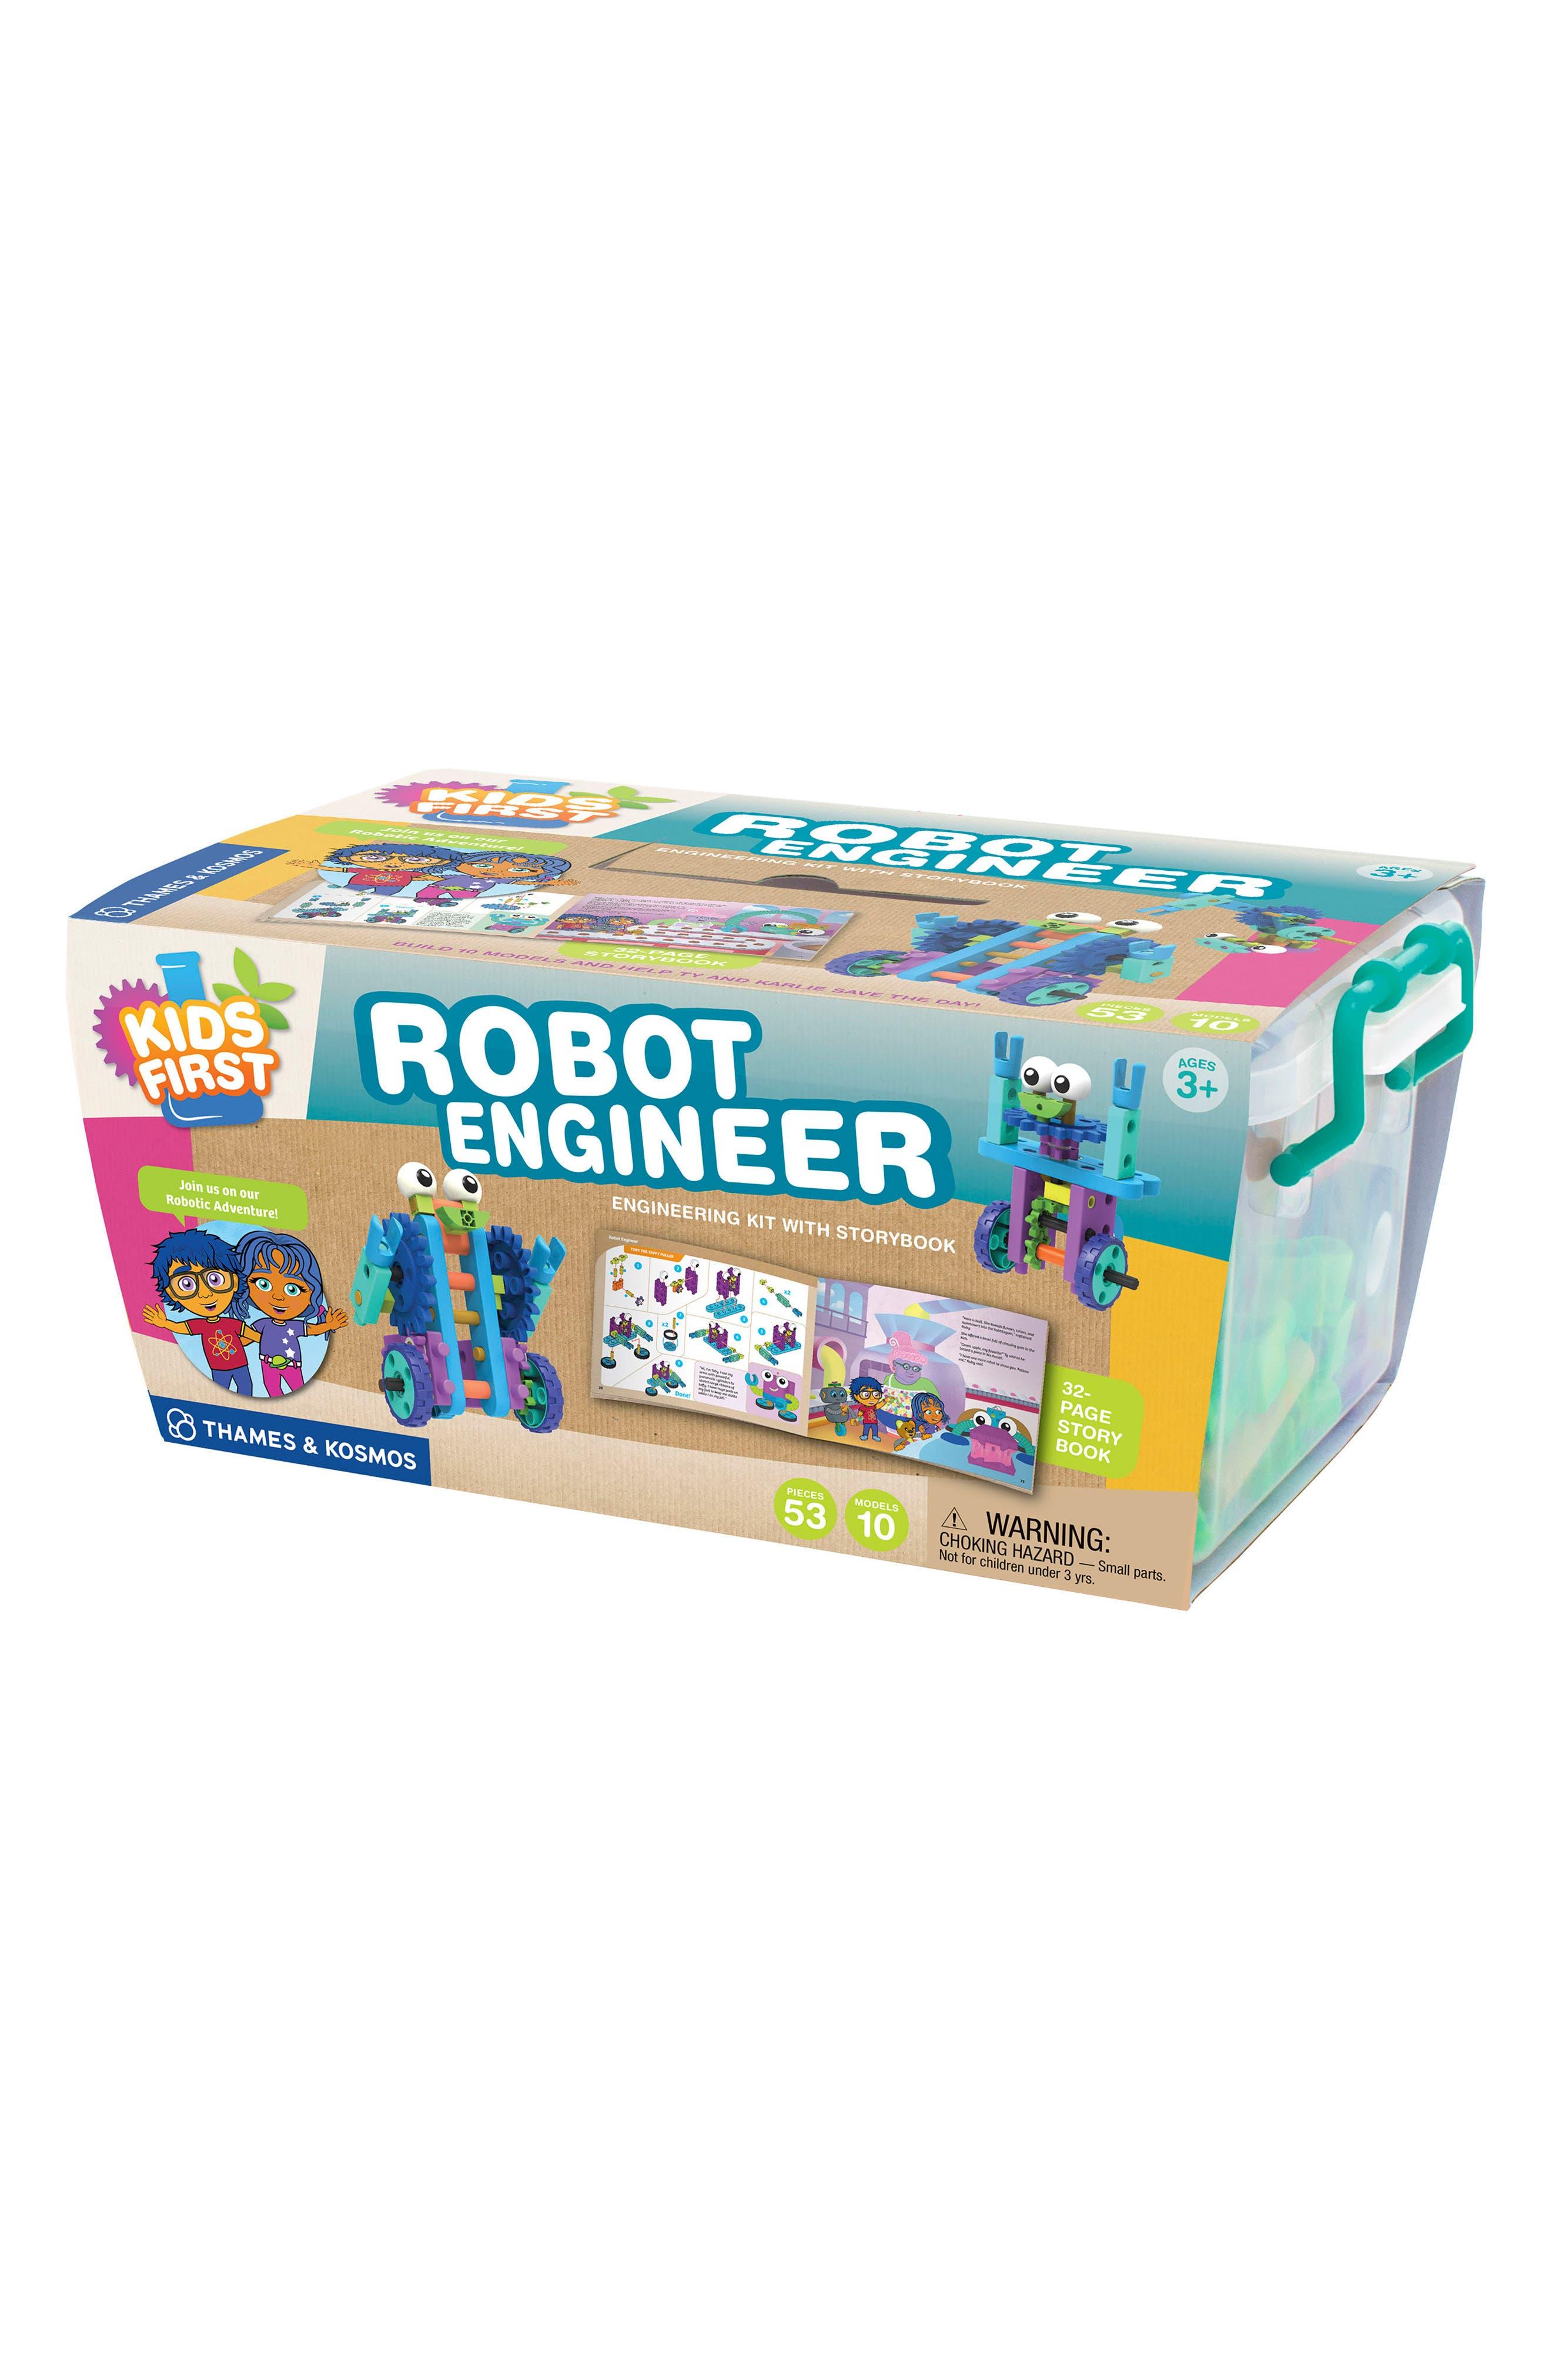 Thames & Kosmos Robot Engineer Building Set & Storybook